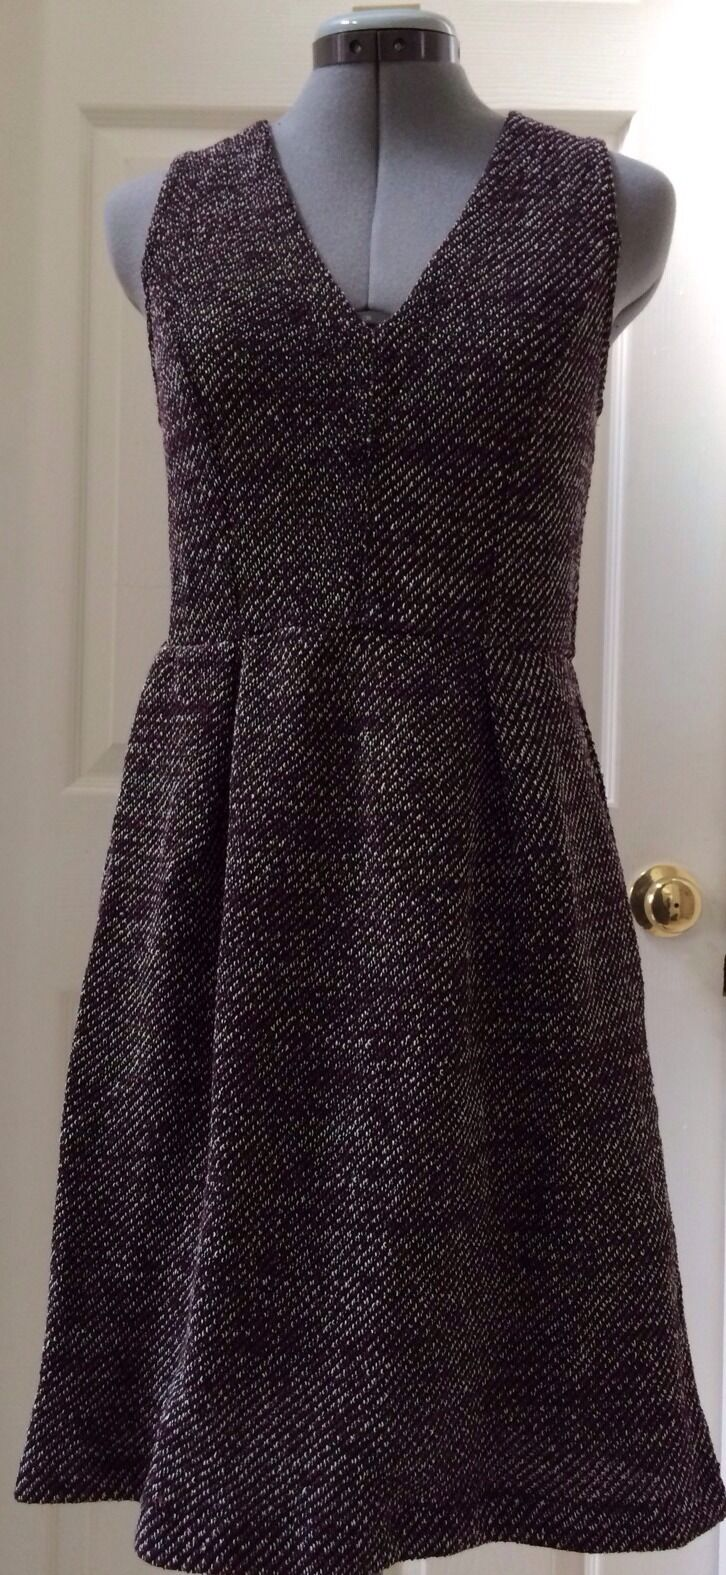 Neuf avec étiquettes MADEWELL de J. CREW terrasse grand Bourgogne robe Größe S